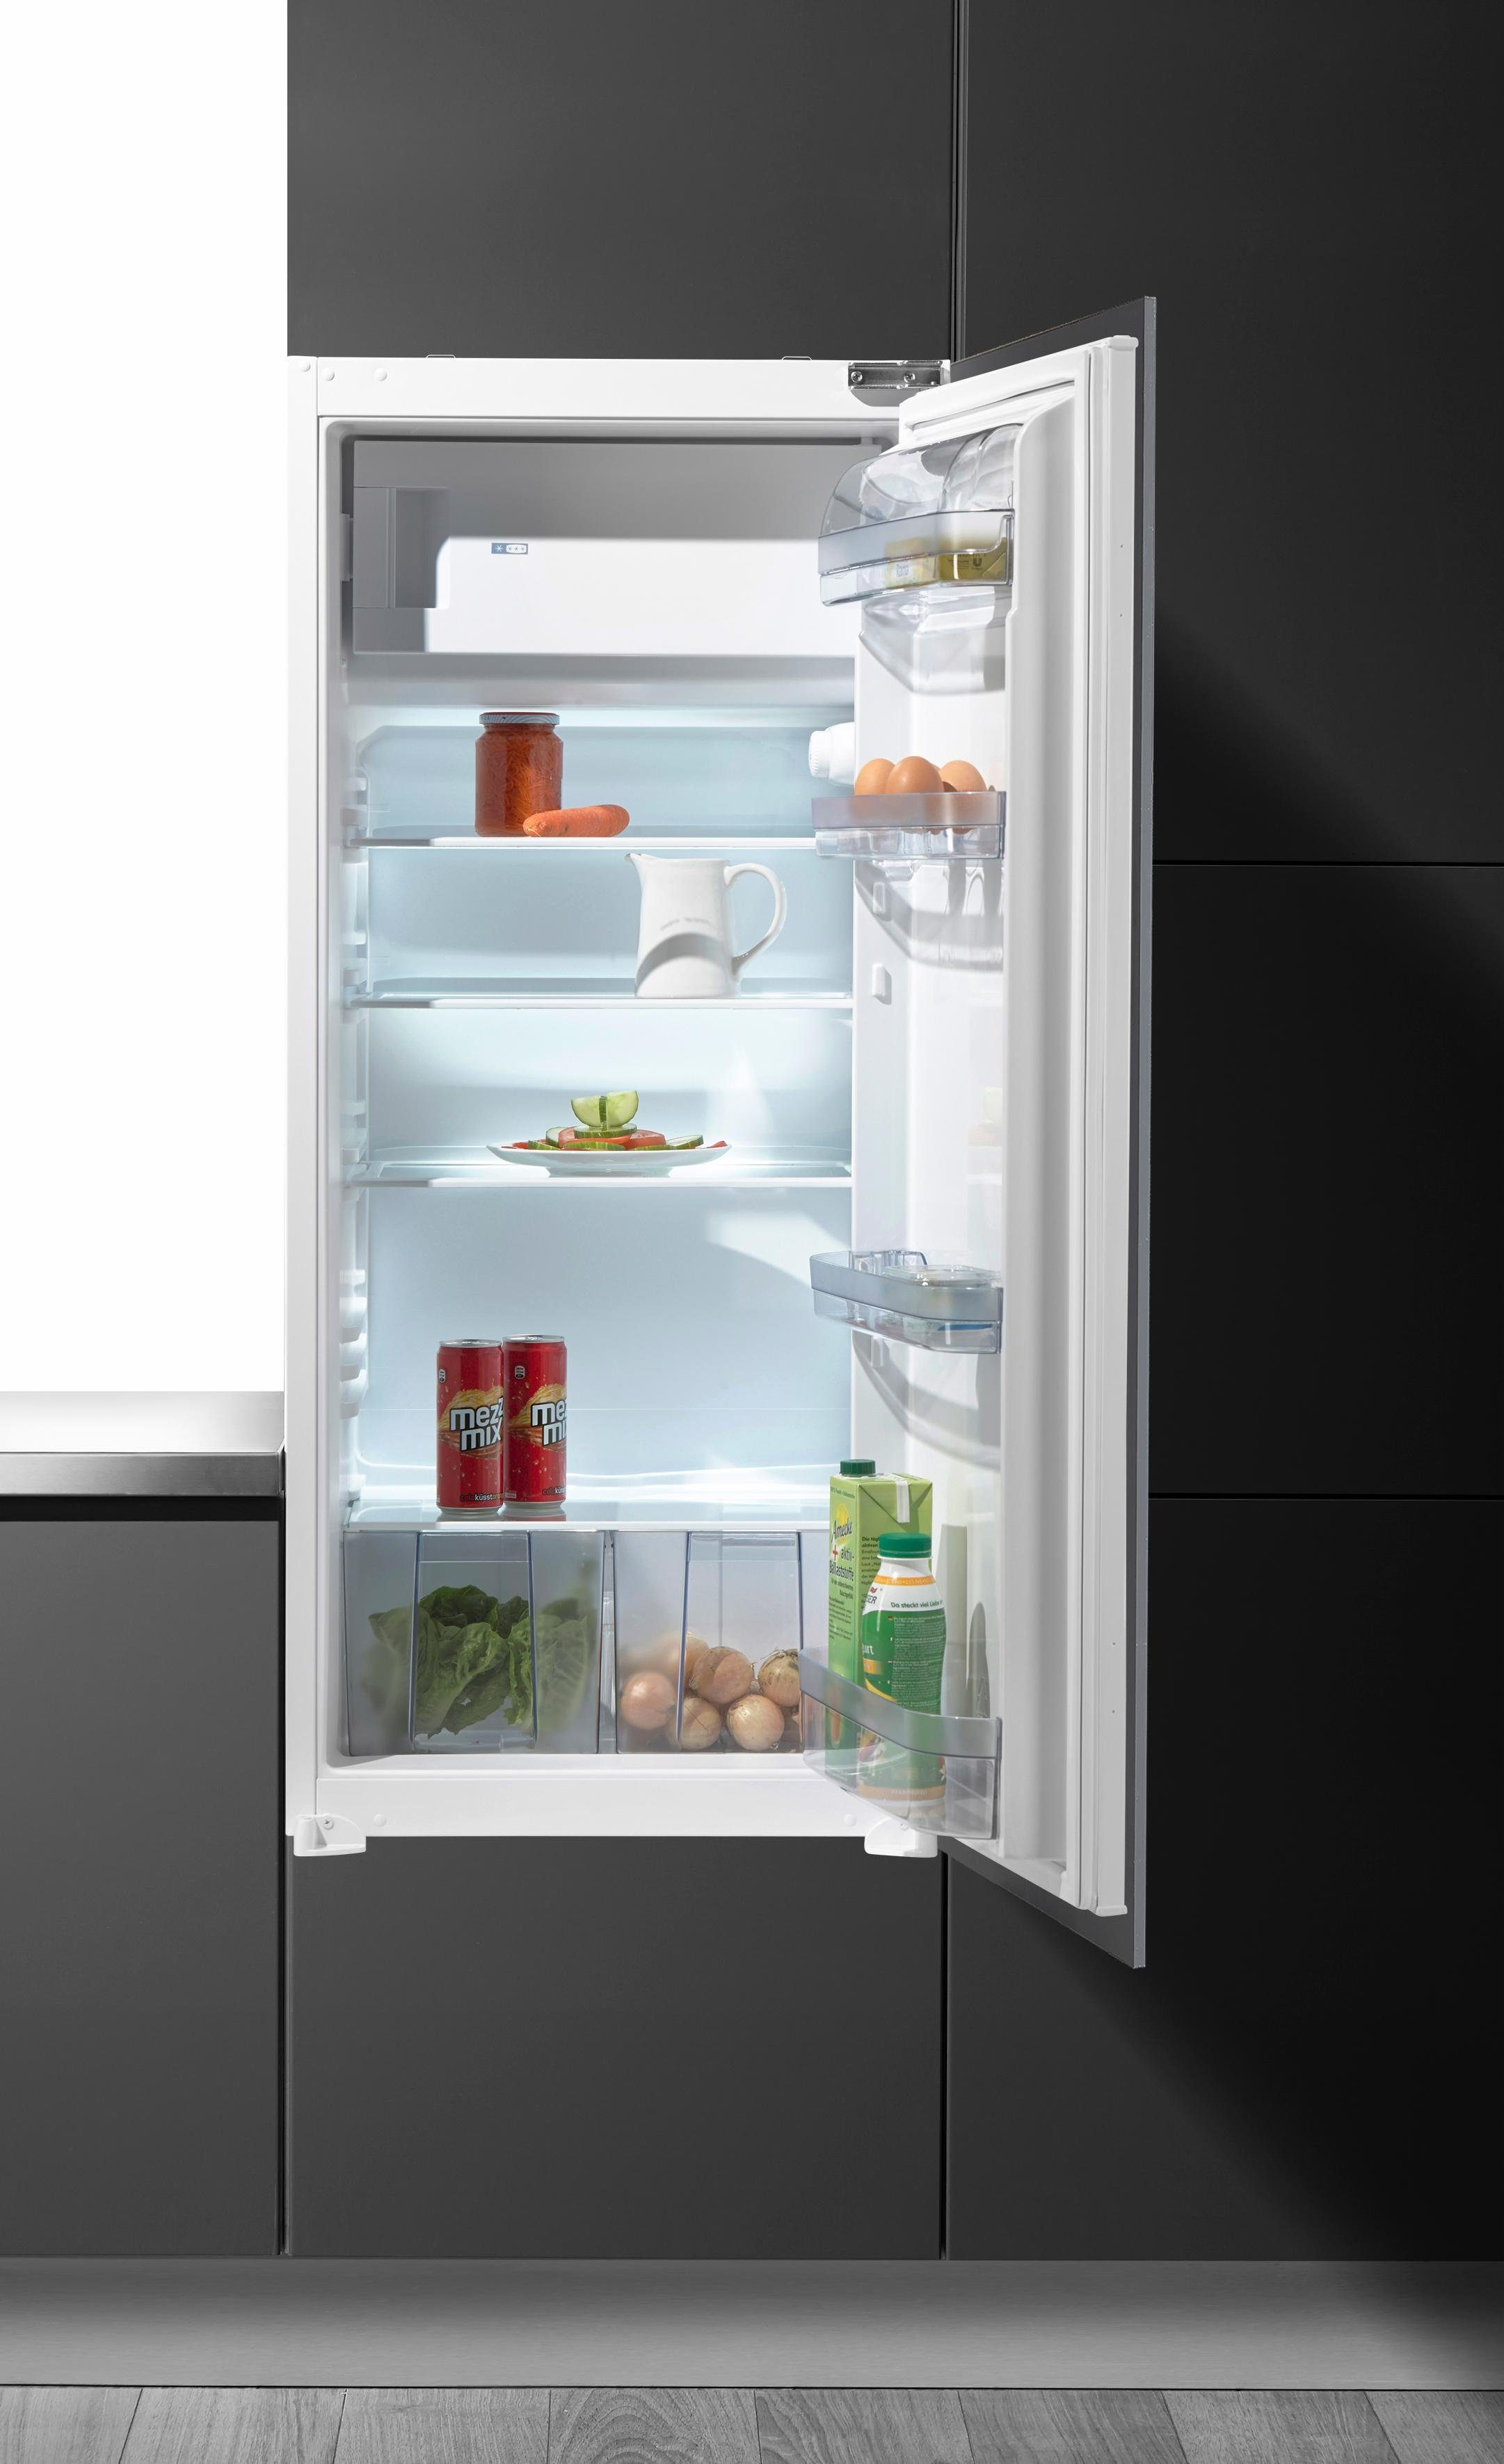 Vestfrost Einbaukühlschrank VKSE 102400 SA++ G, A++, 122,5 cm hoch